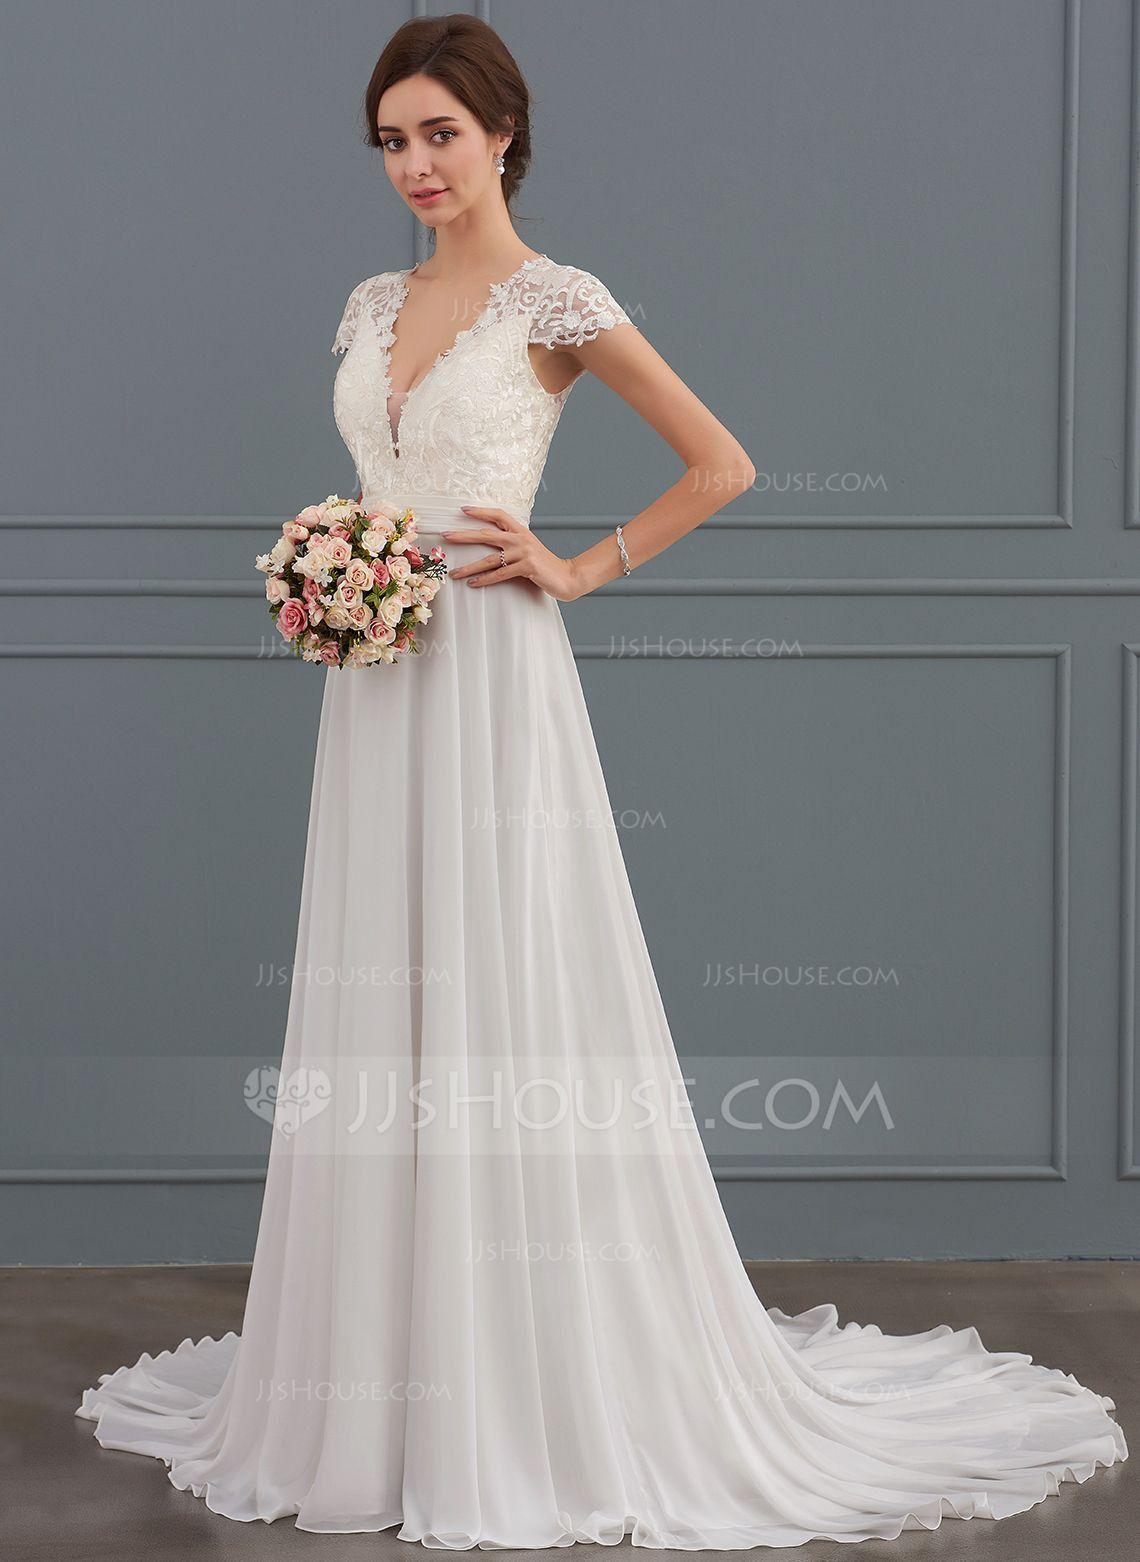 Beautiful Robe De Mariée Princesse Jjshouse   Petite wedding dress ...